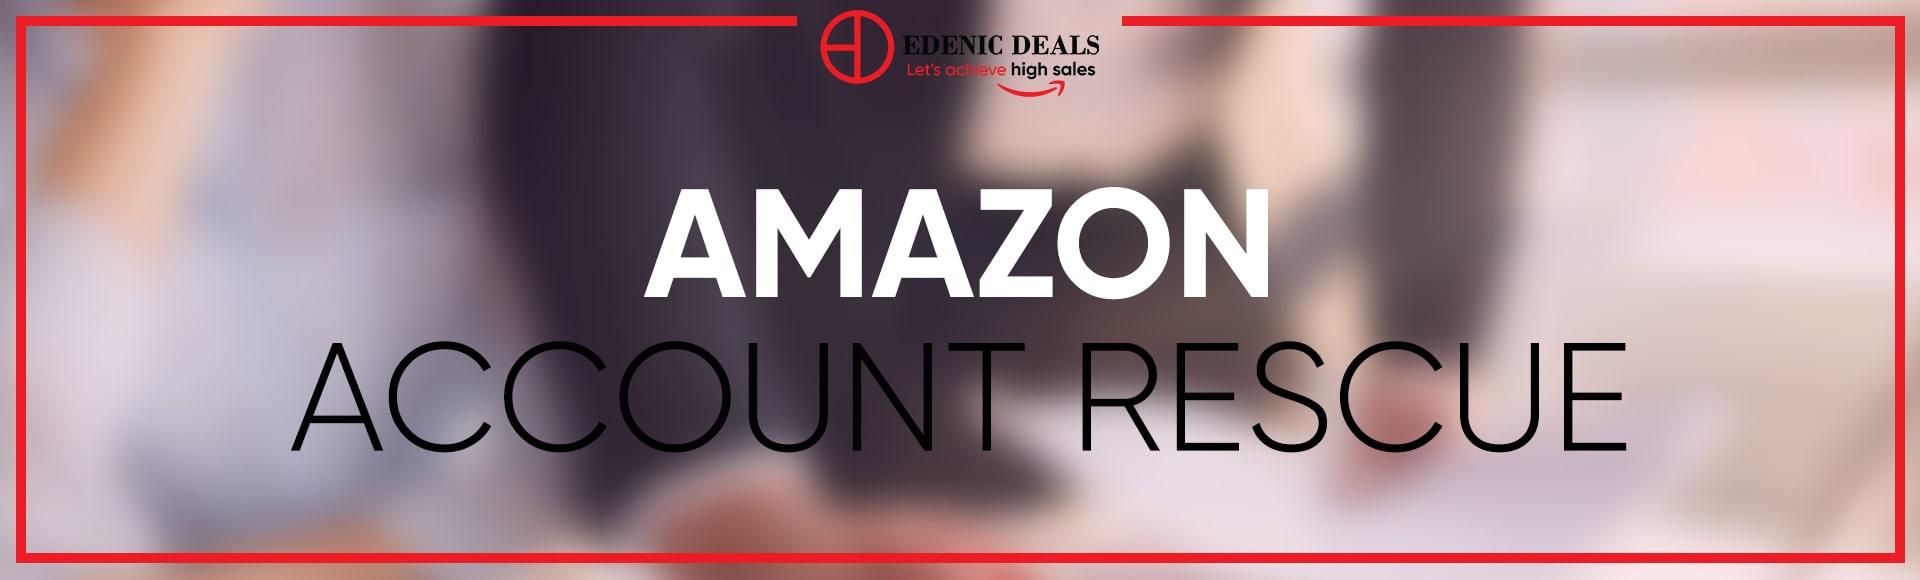 Amazon Account Rescue Edenic Deals